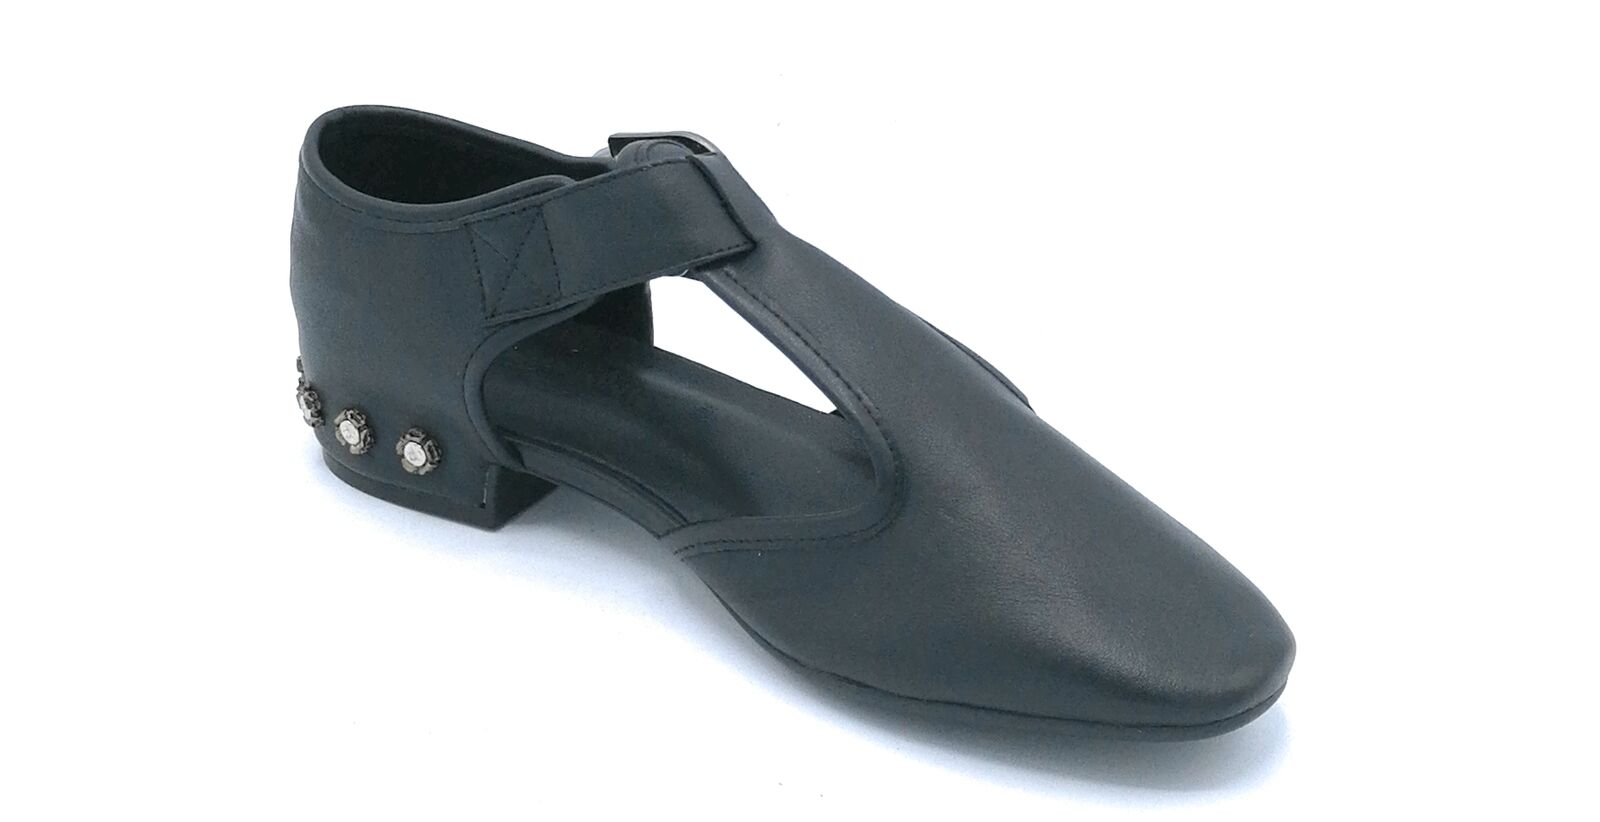 Rebecca 701 chaussure faible cuir noir ouvert côté avec fib fib fib 0252b8